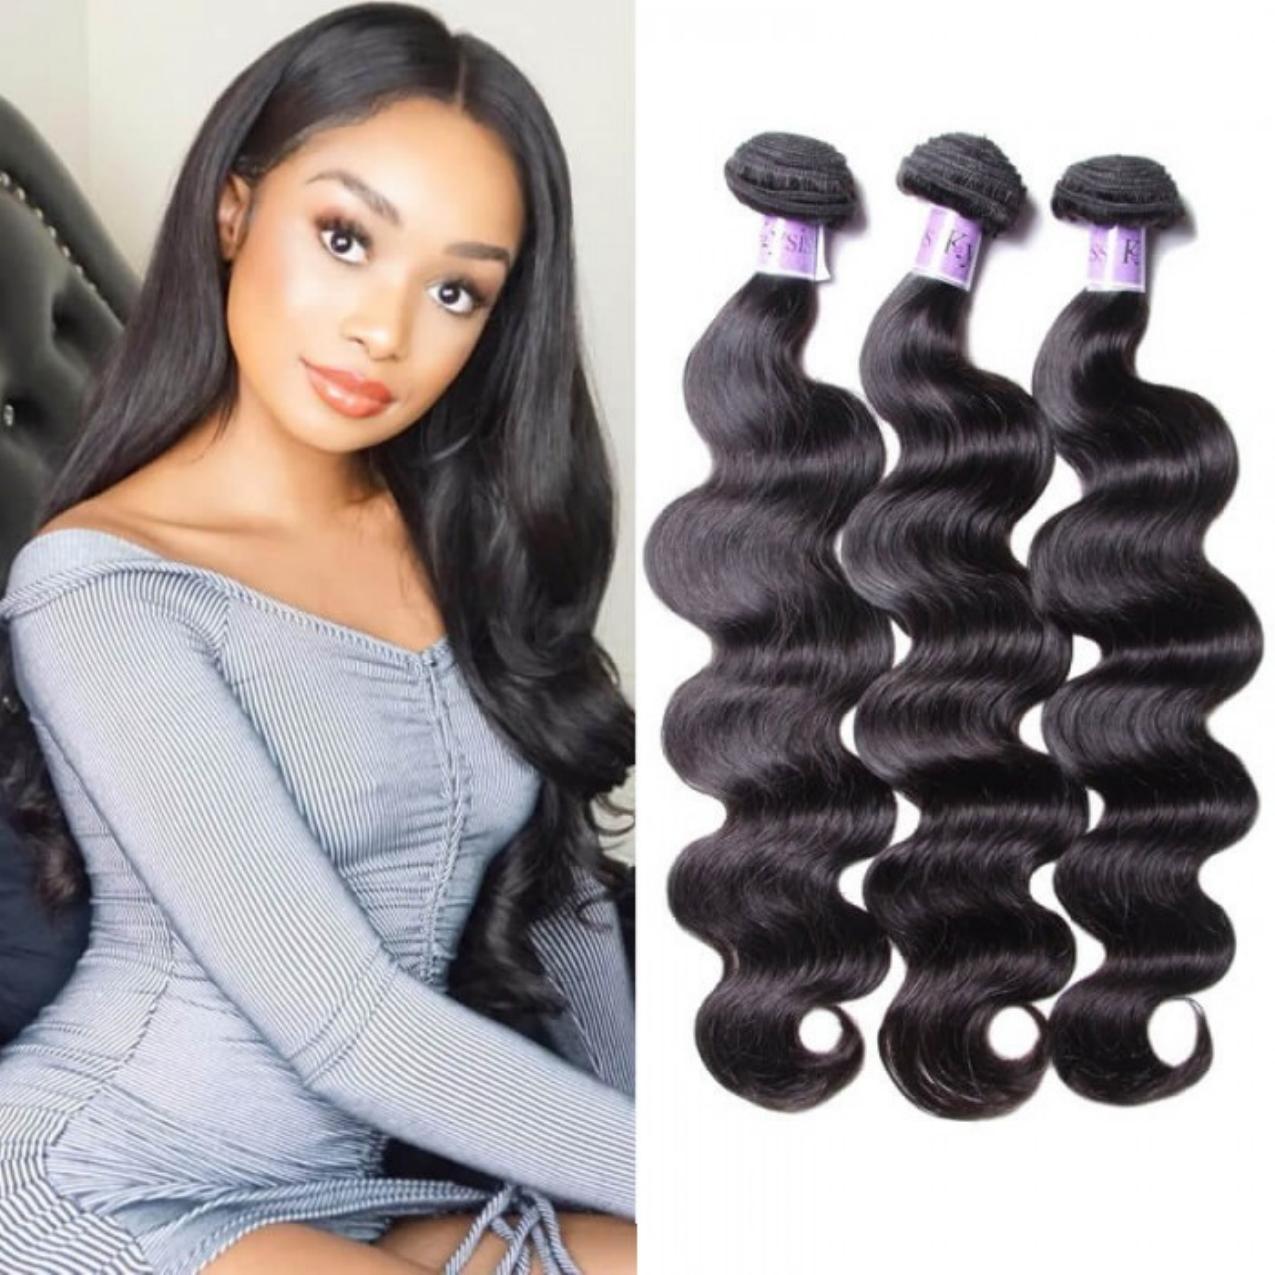 UNice Hair Kysiss Series 8A Grade Peruvian 100% Virgin Human Hair Body Wave 3 Bundles